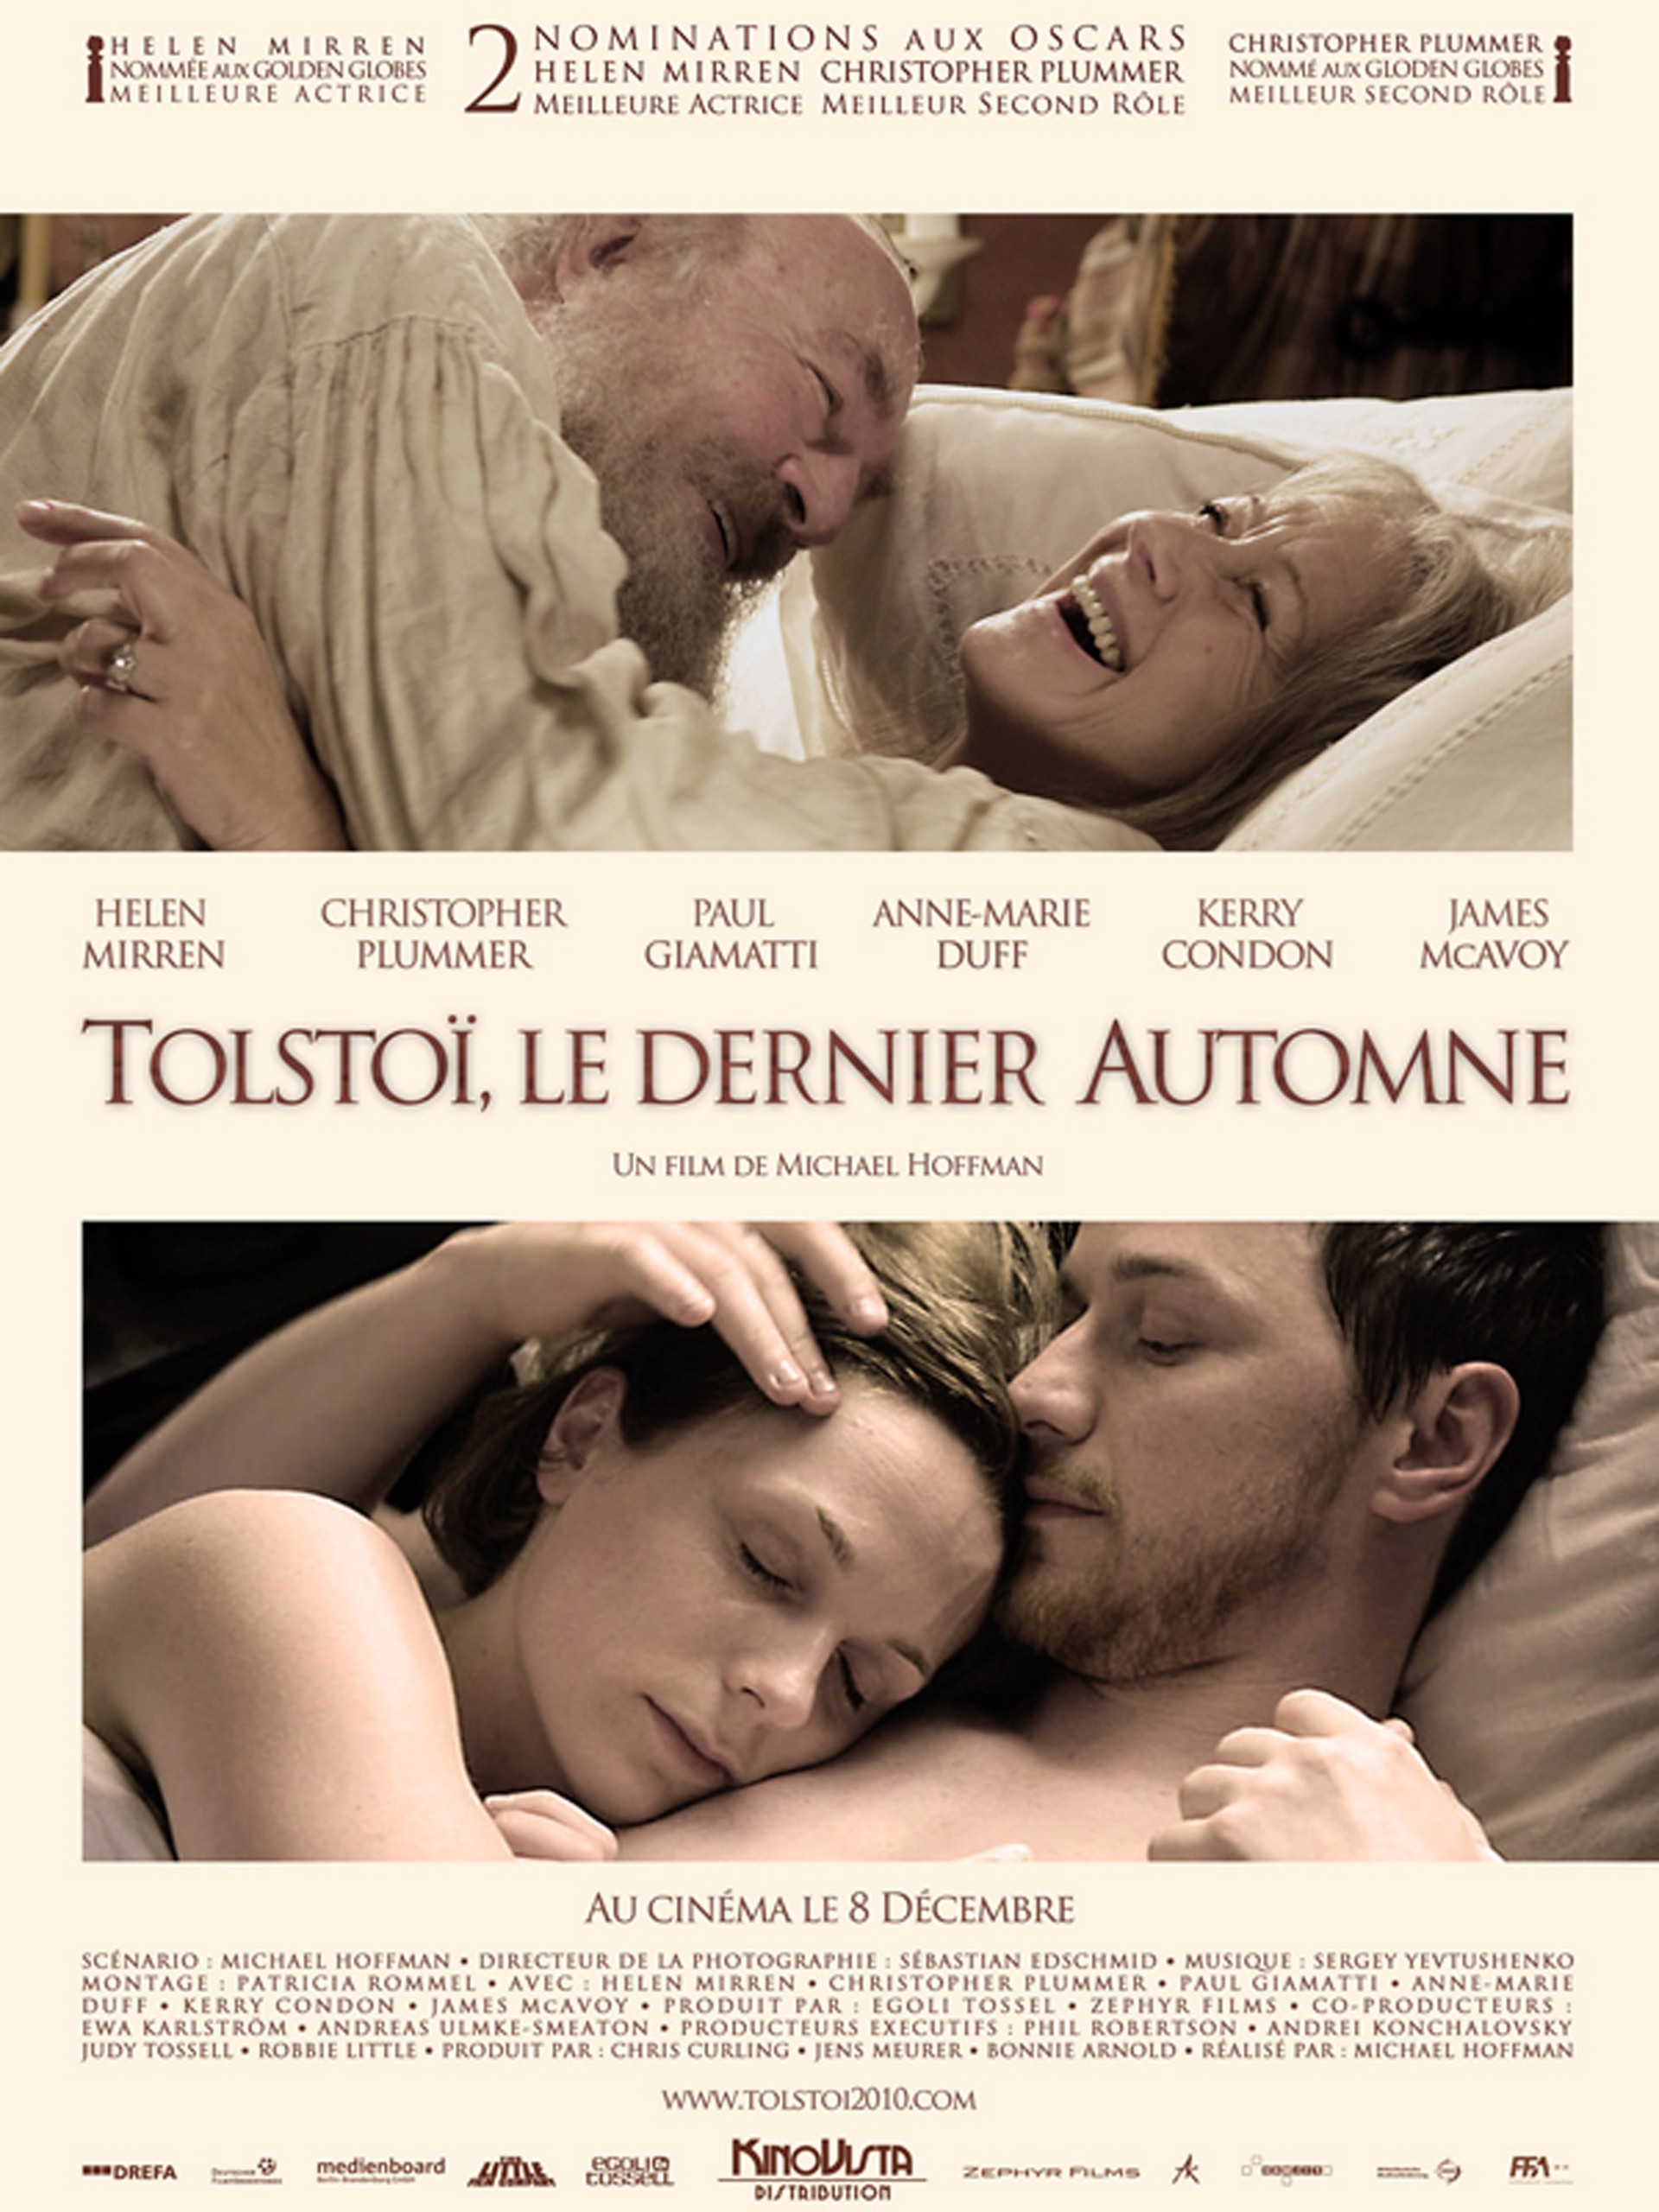 Tolstoï le dernier automne [BRRIP-AC3] [FRENCH] [MULTI]